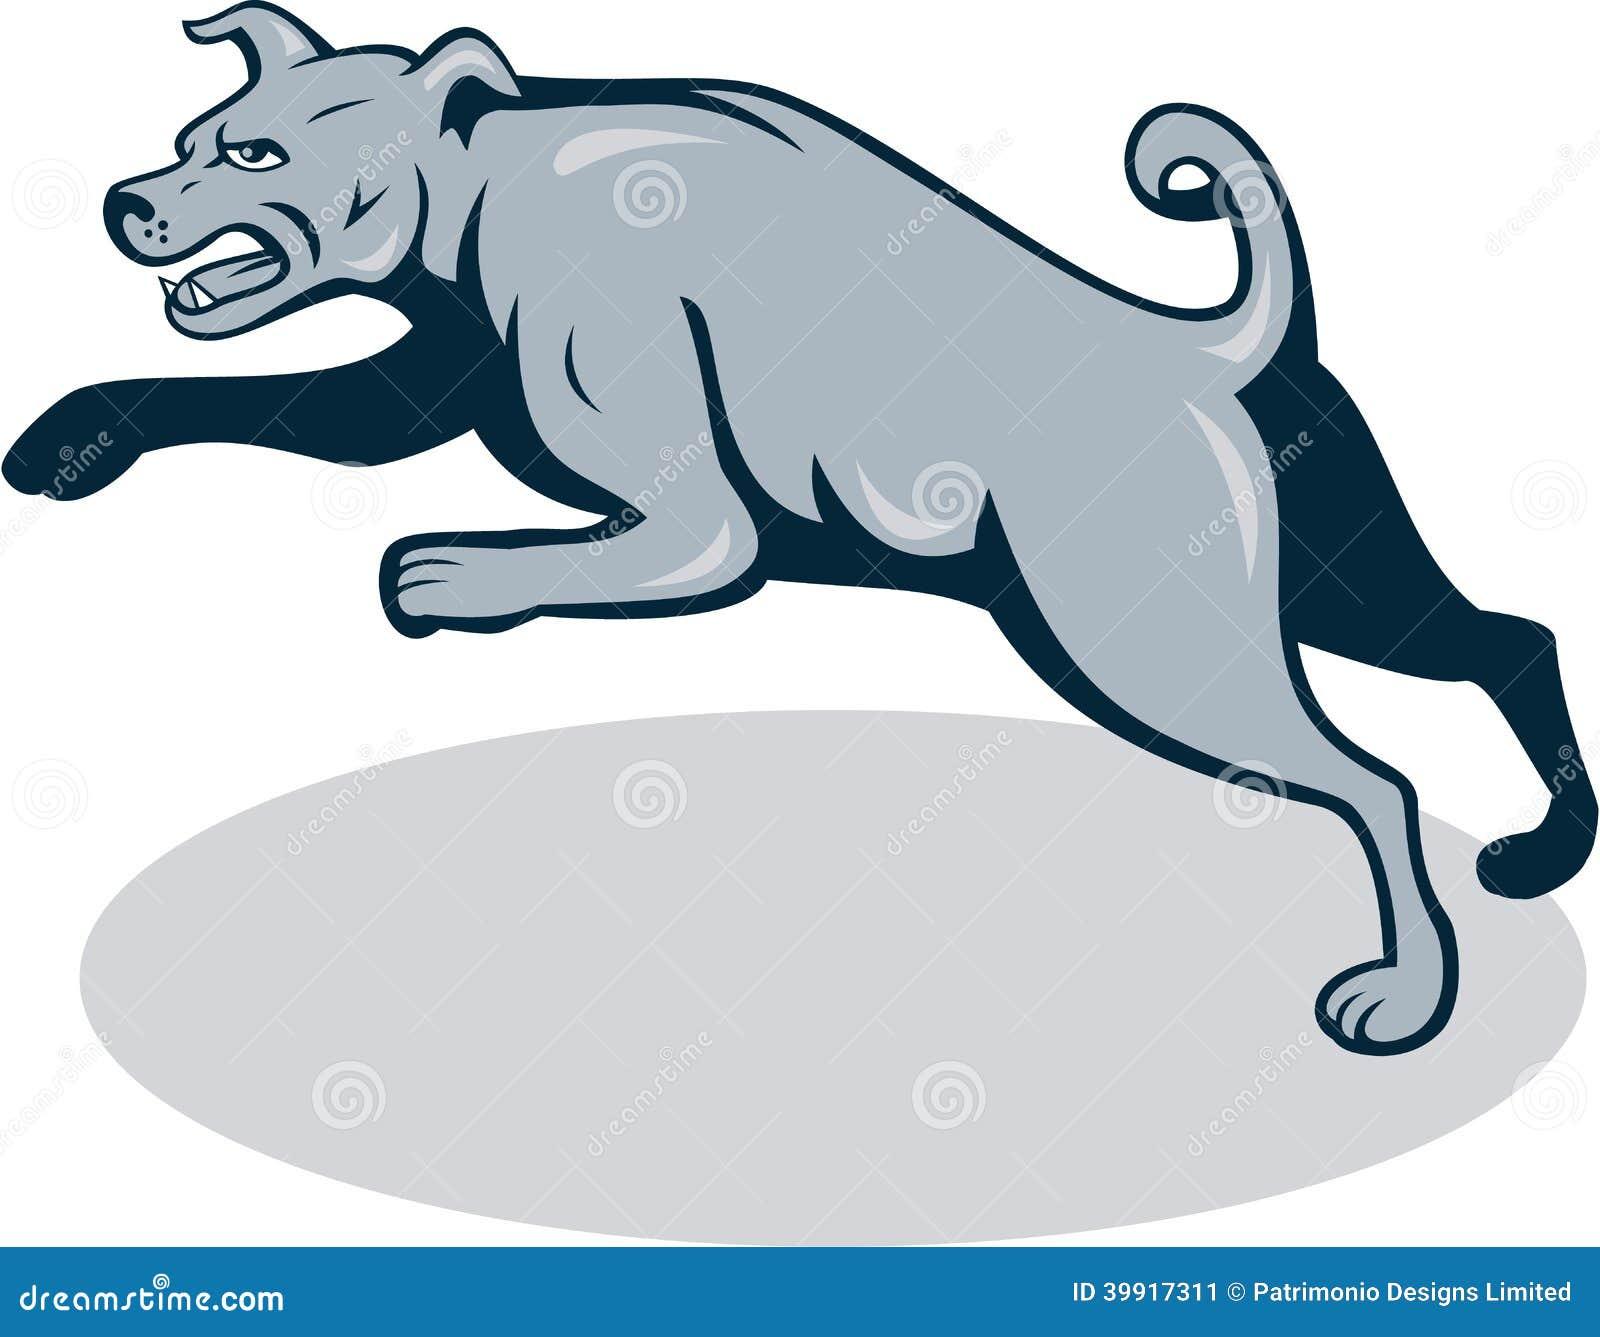 Cartoon Picture Dog Barking